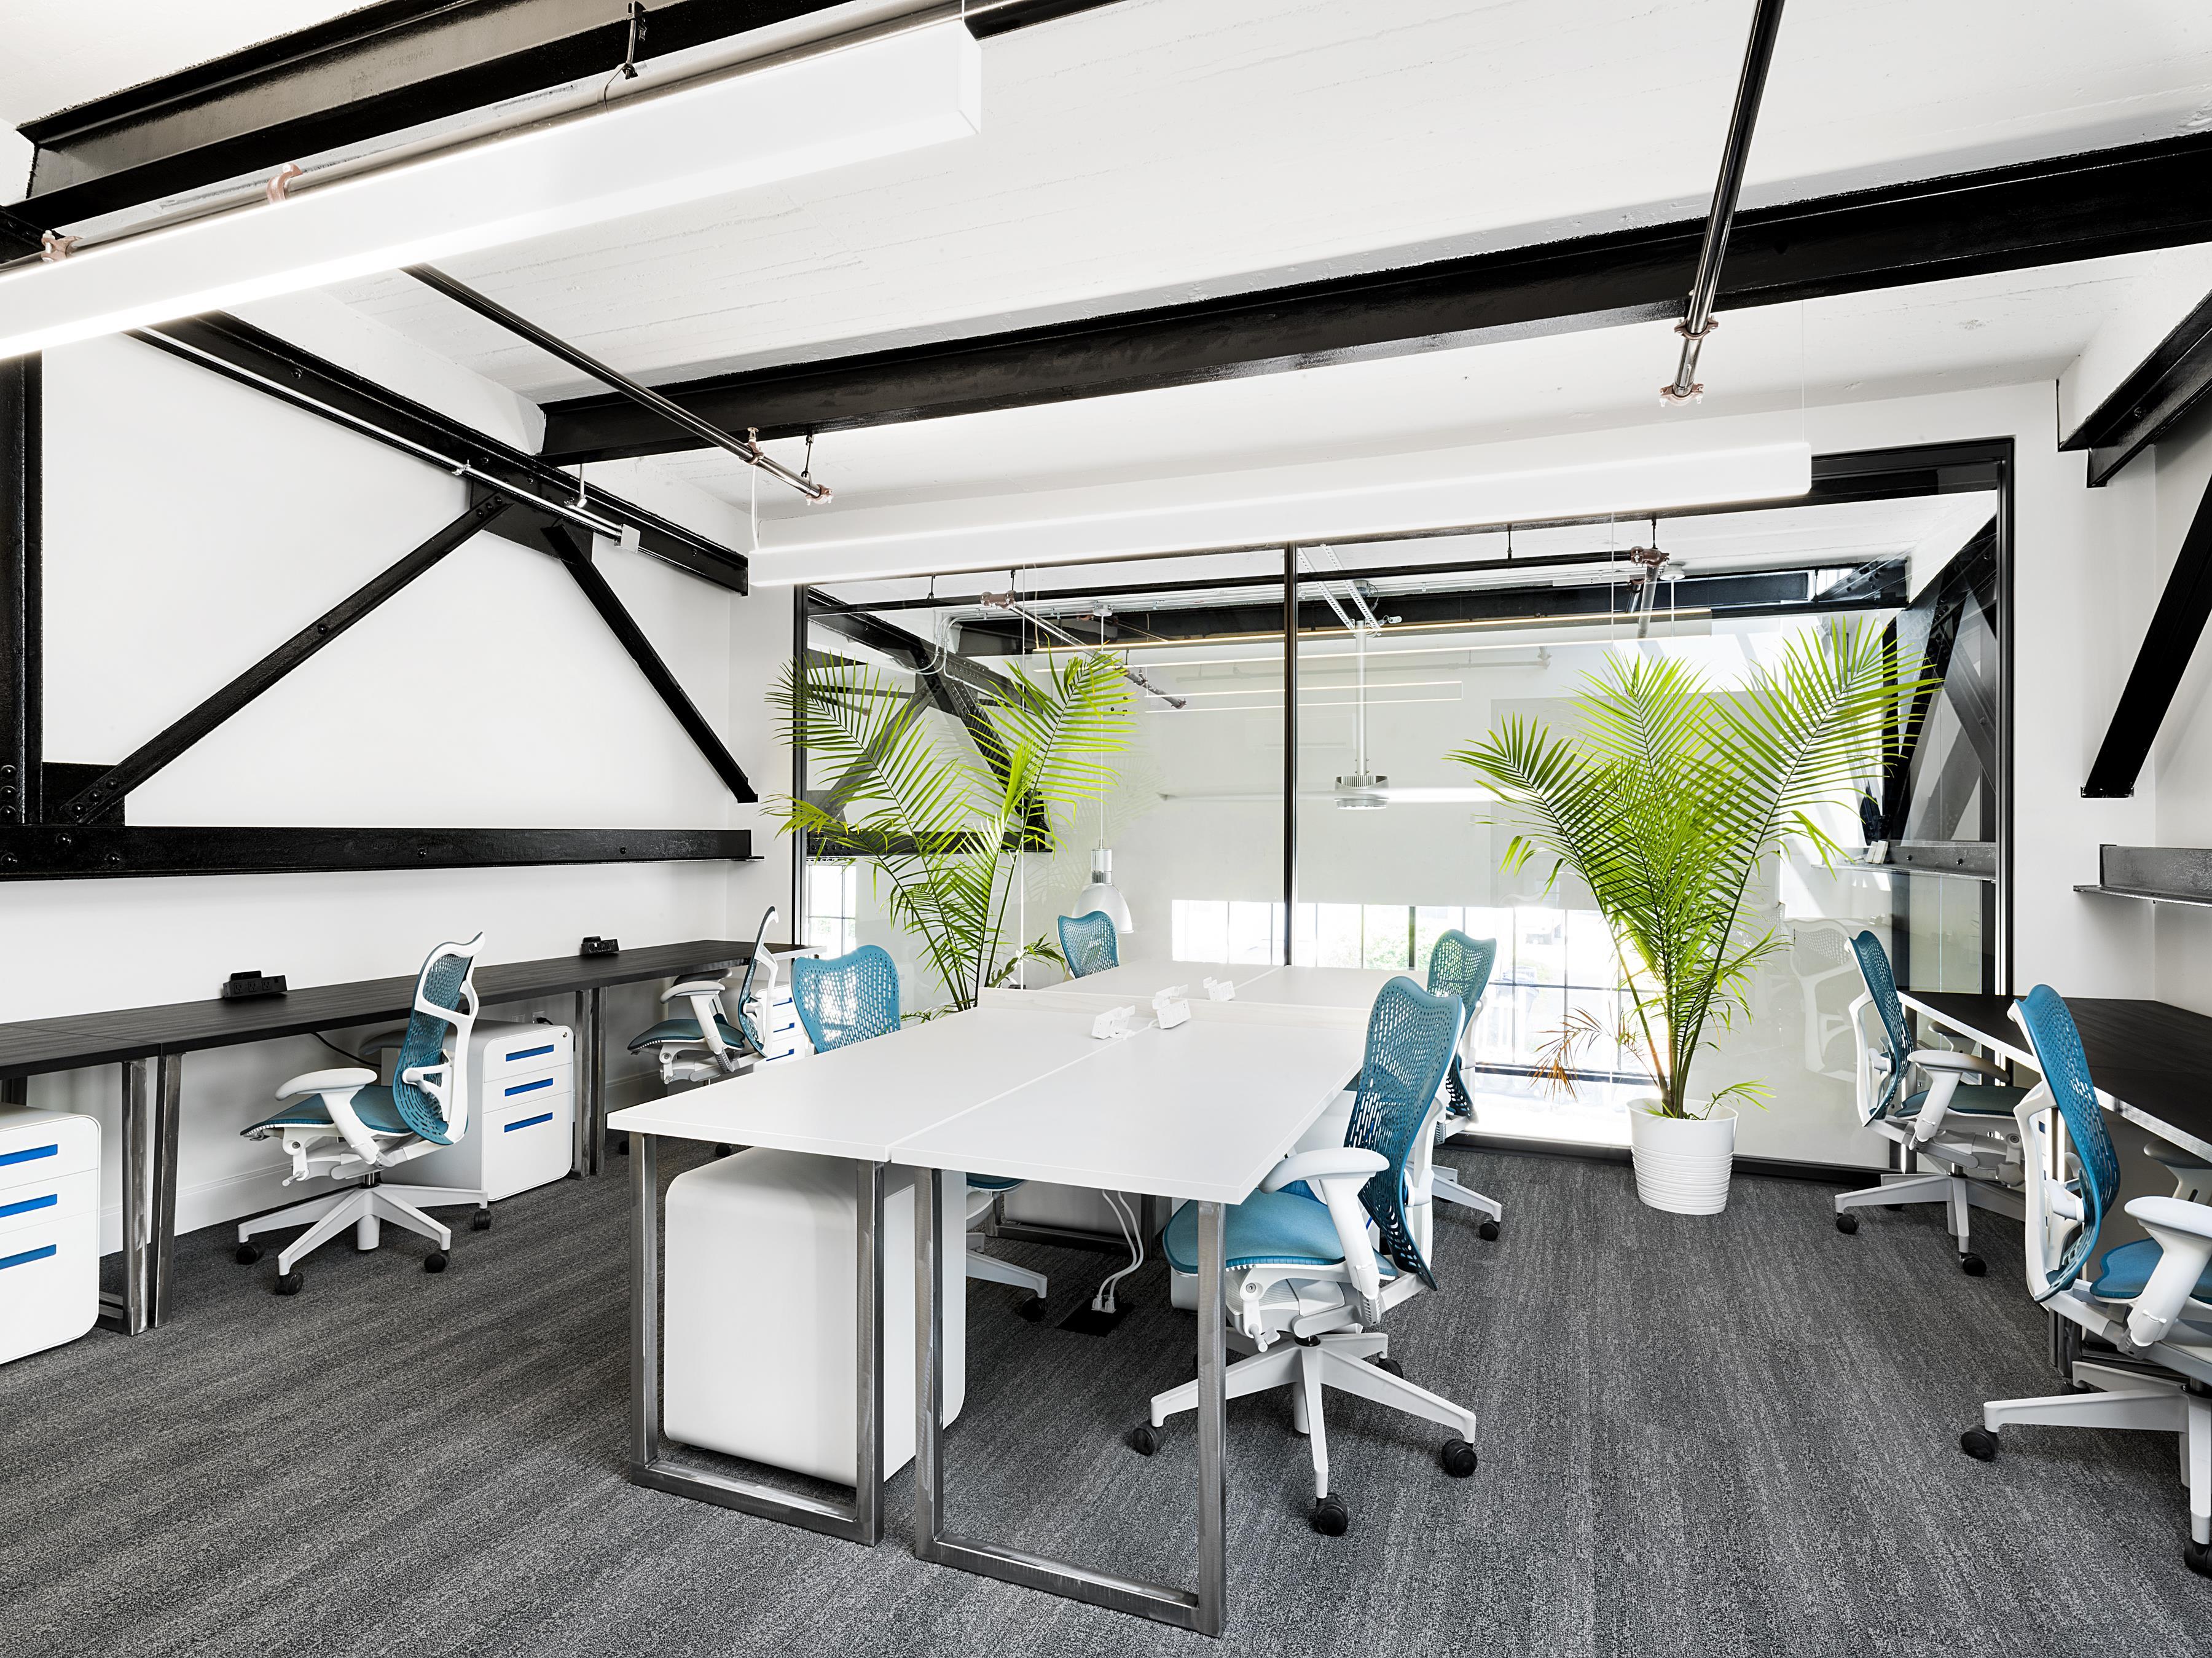 WorkSpace @ New Market - Dedicated Desk